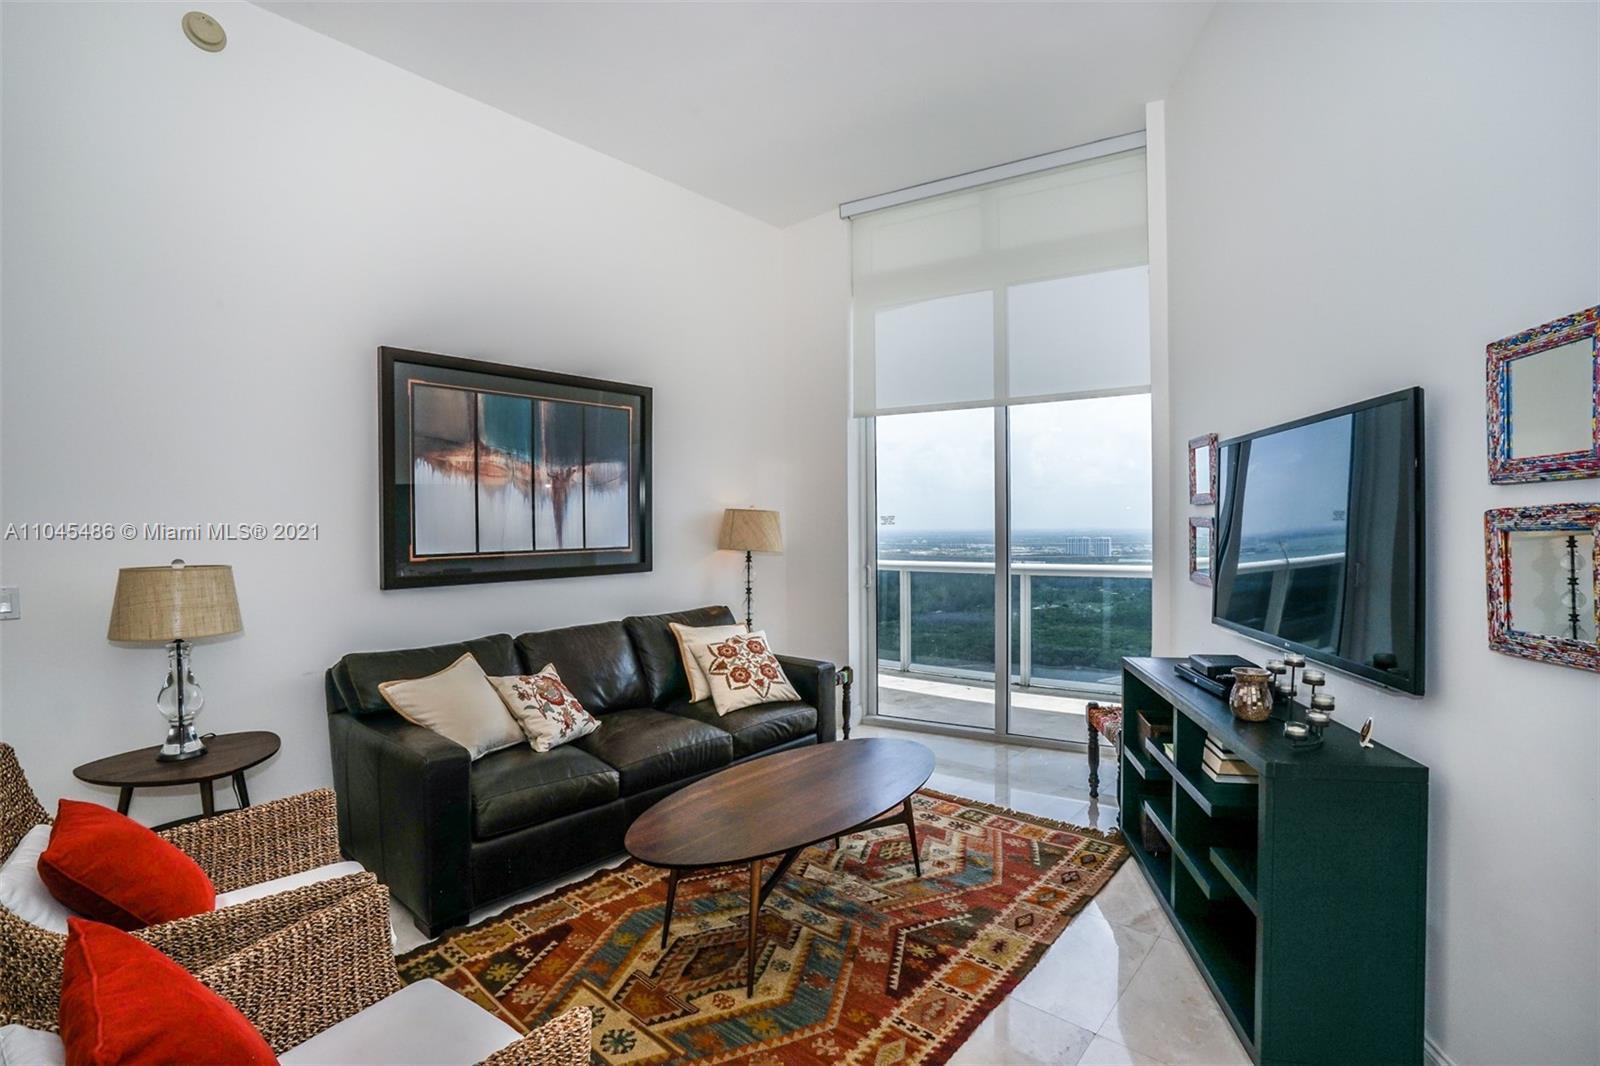 Trump Tower III #4205 - 15811 Collins Ave #4205, Sunny Isles Beach, FL 33160